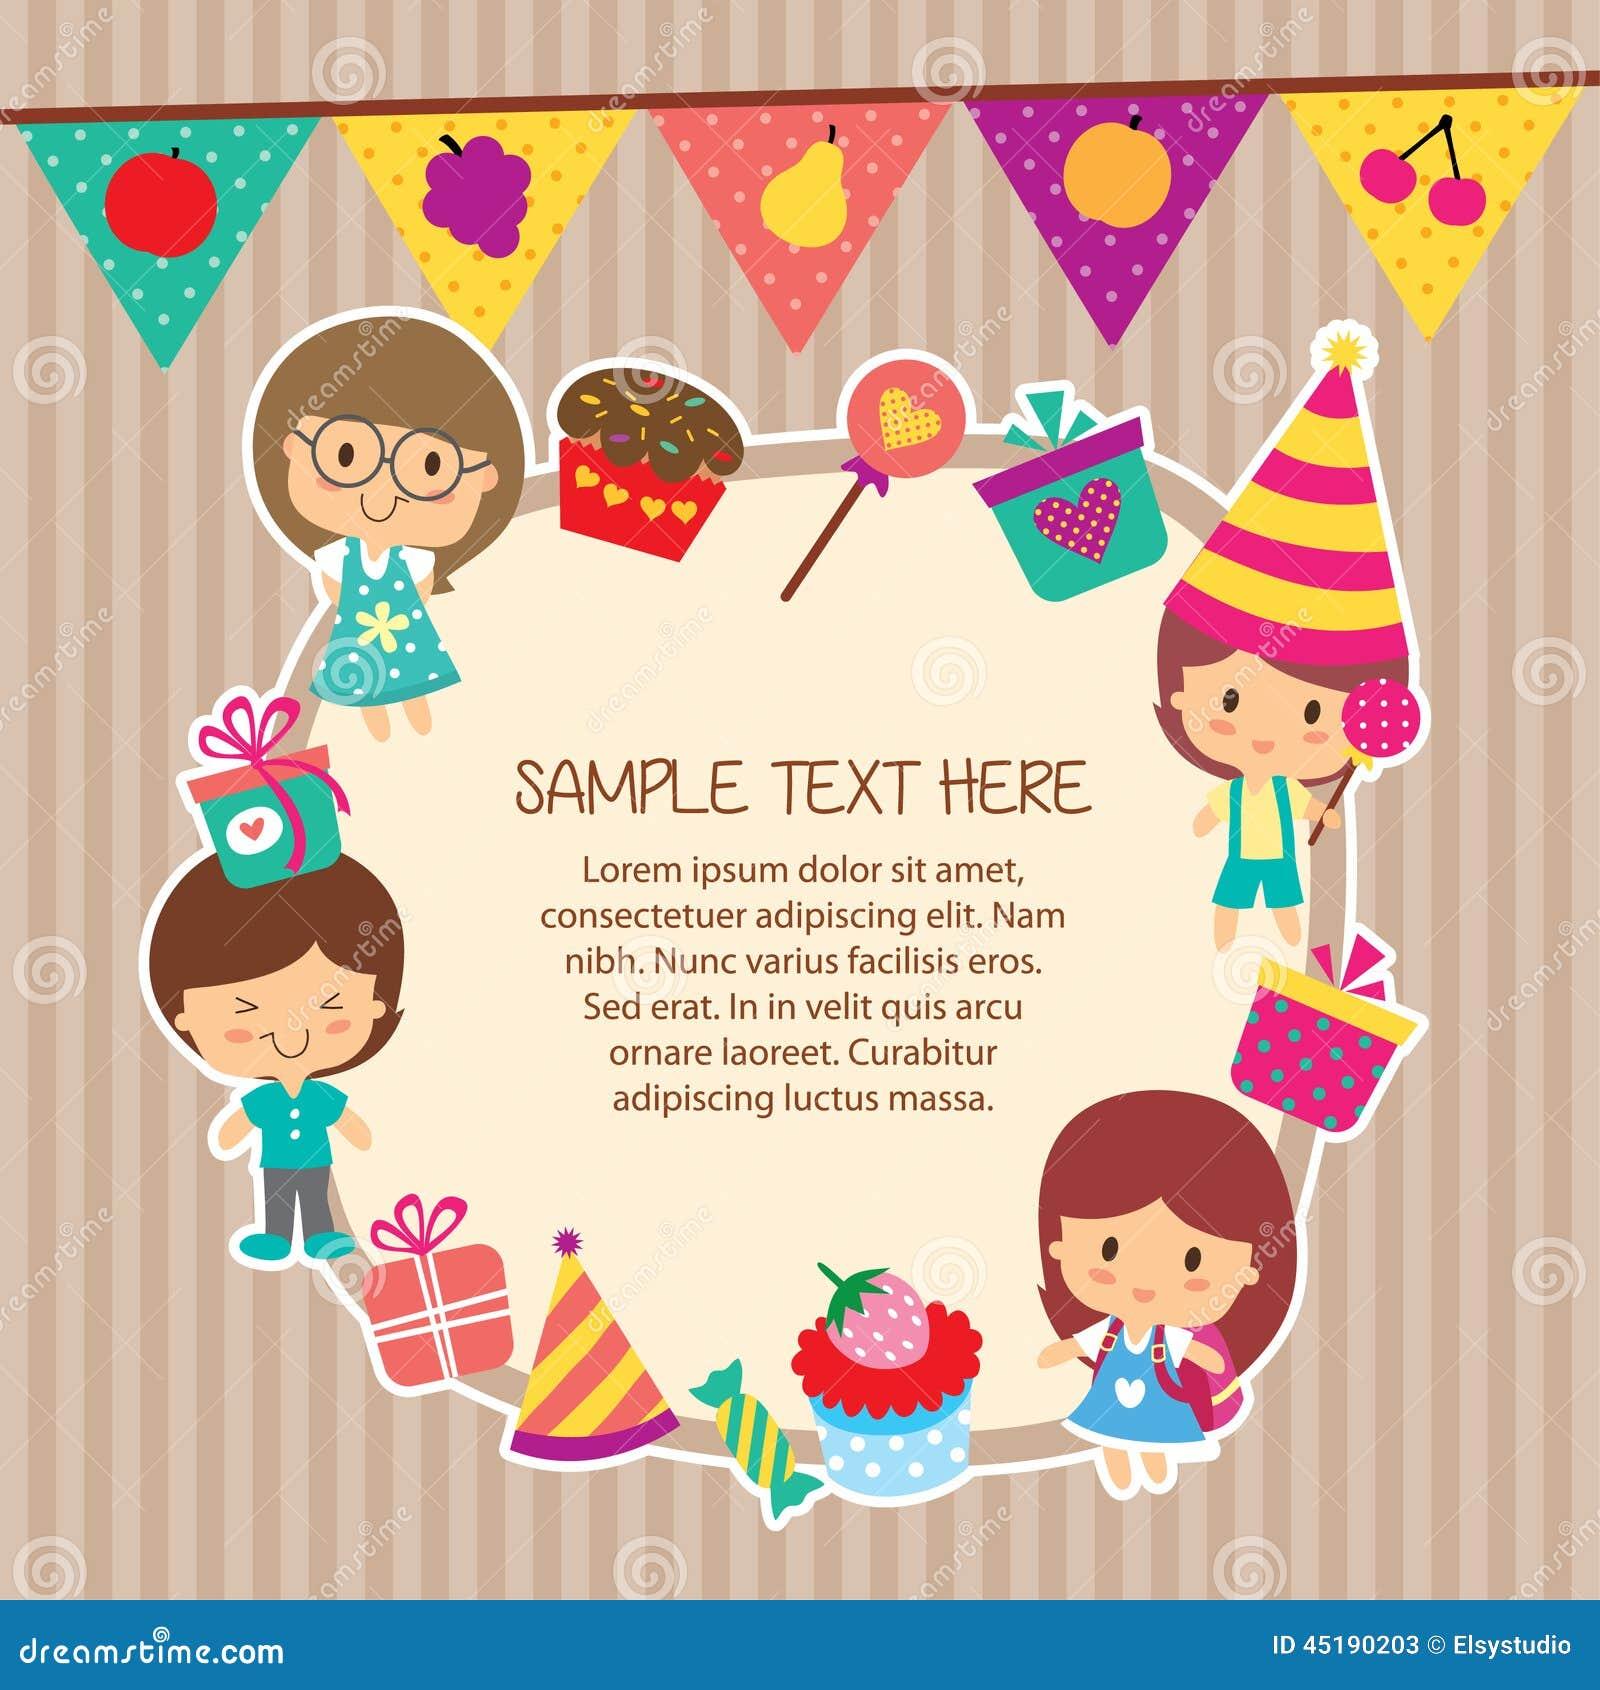 Kids Party Layout Frame Design Stock Illustration Image